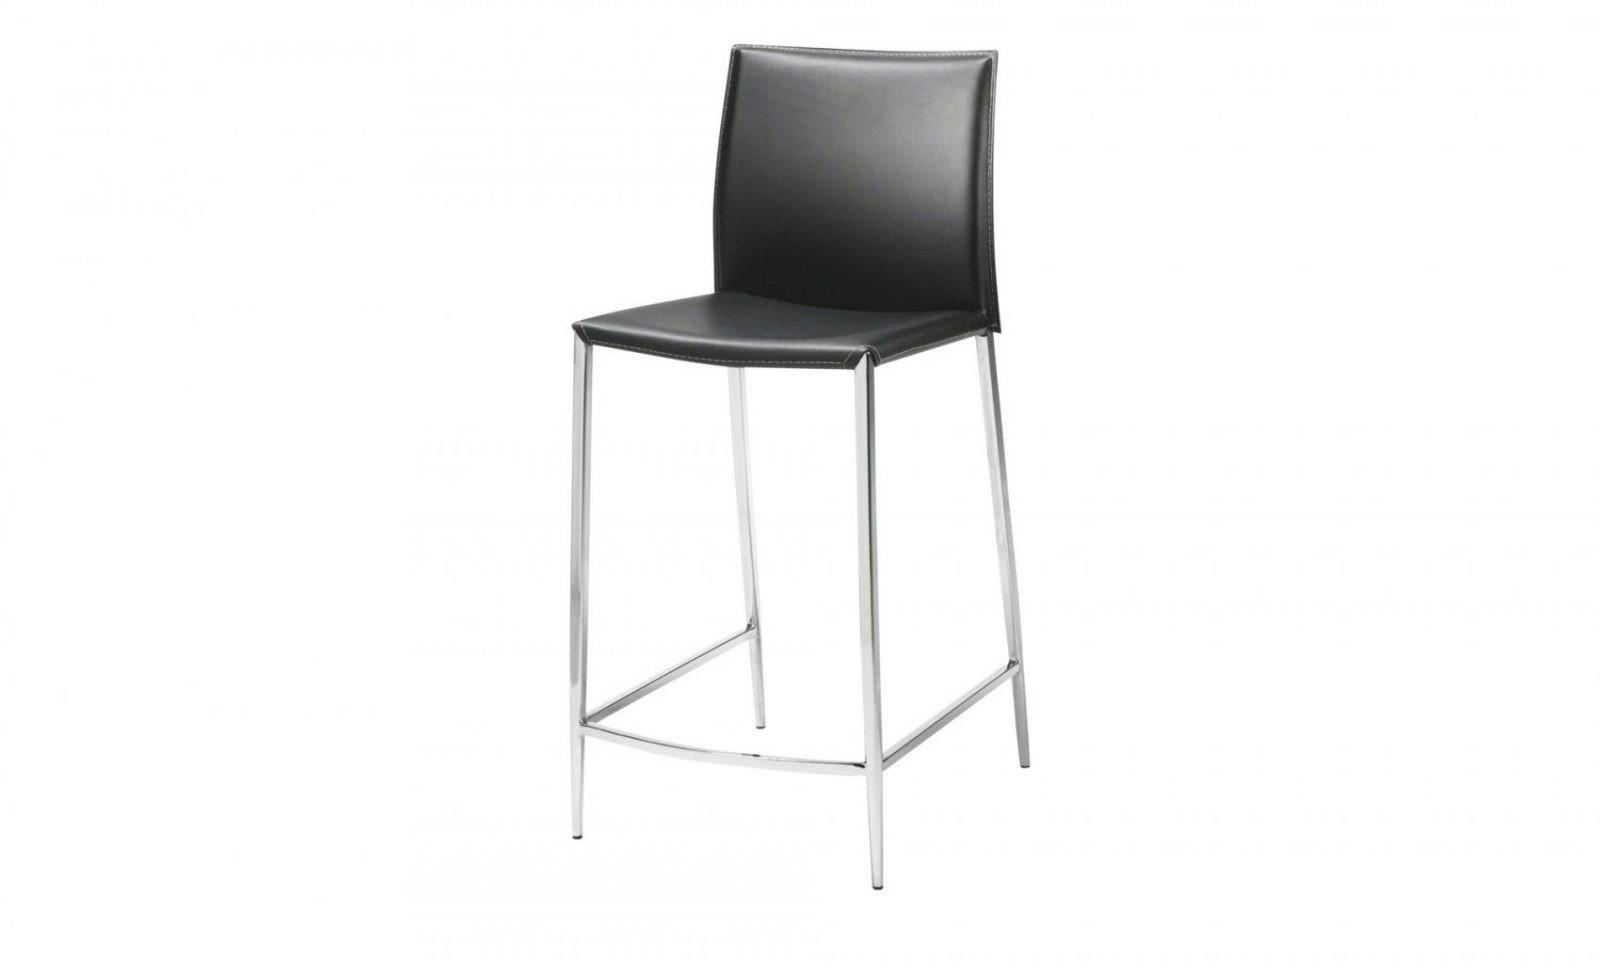 tresenhocker 60 cm sitzh he haus design ideen. Black Bedroom Furniture Sets. Home Design Ideas